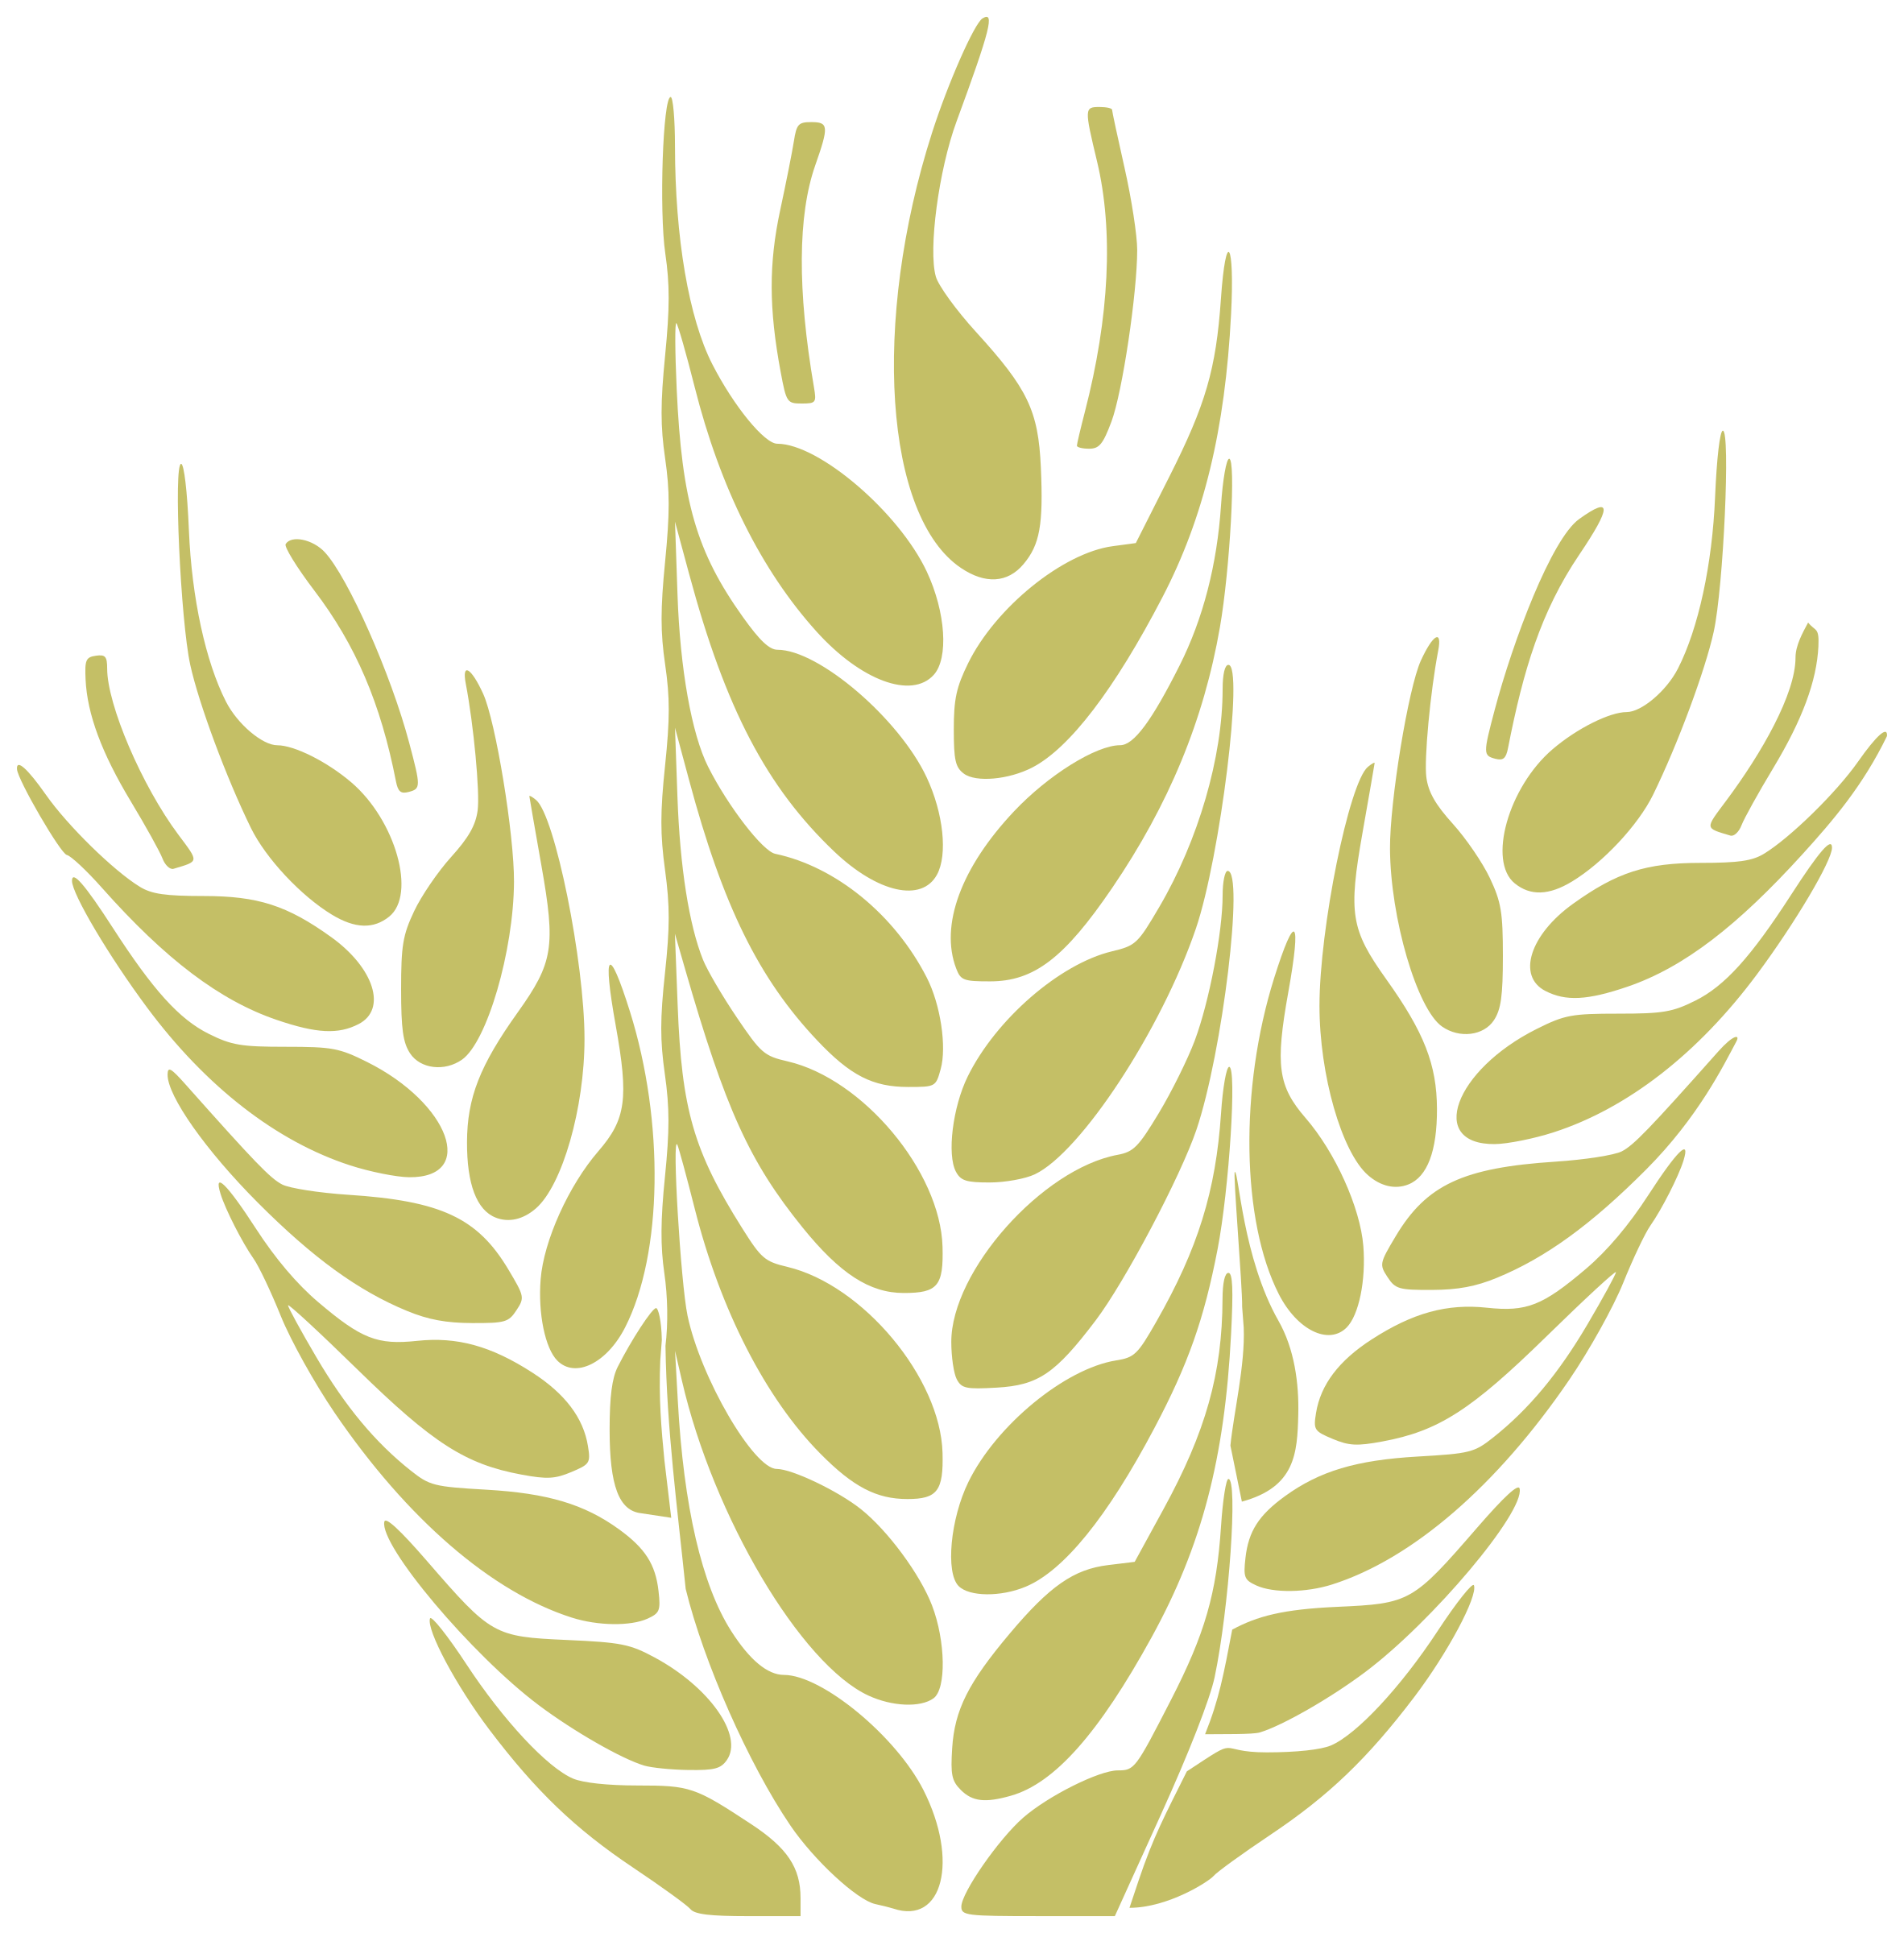 Grains clipart sack grain. Wheat trigo big image